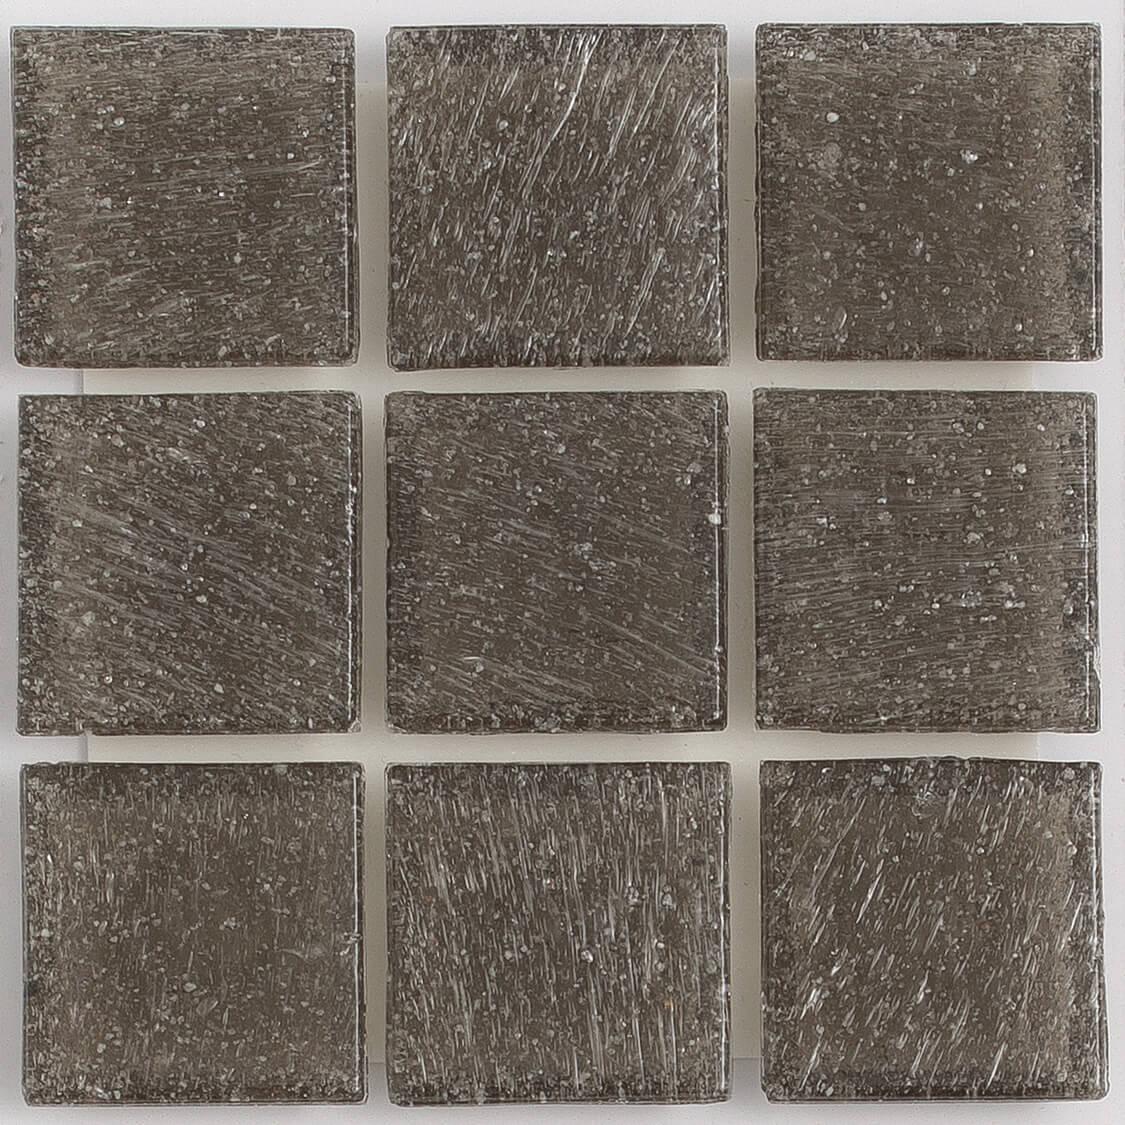 252.21 Ironstone Sand